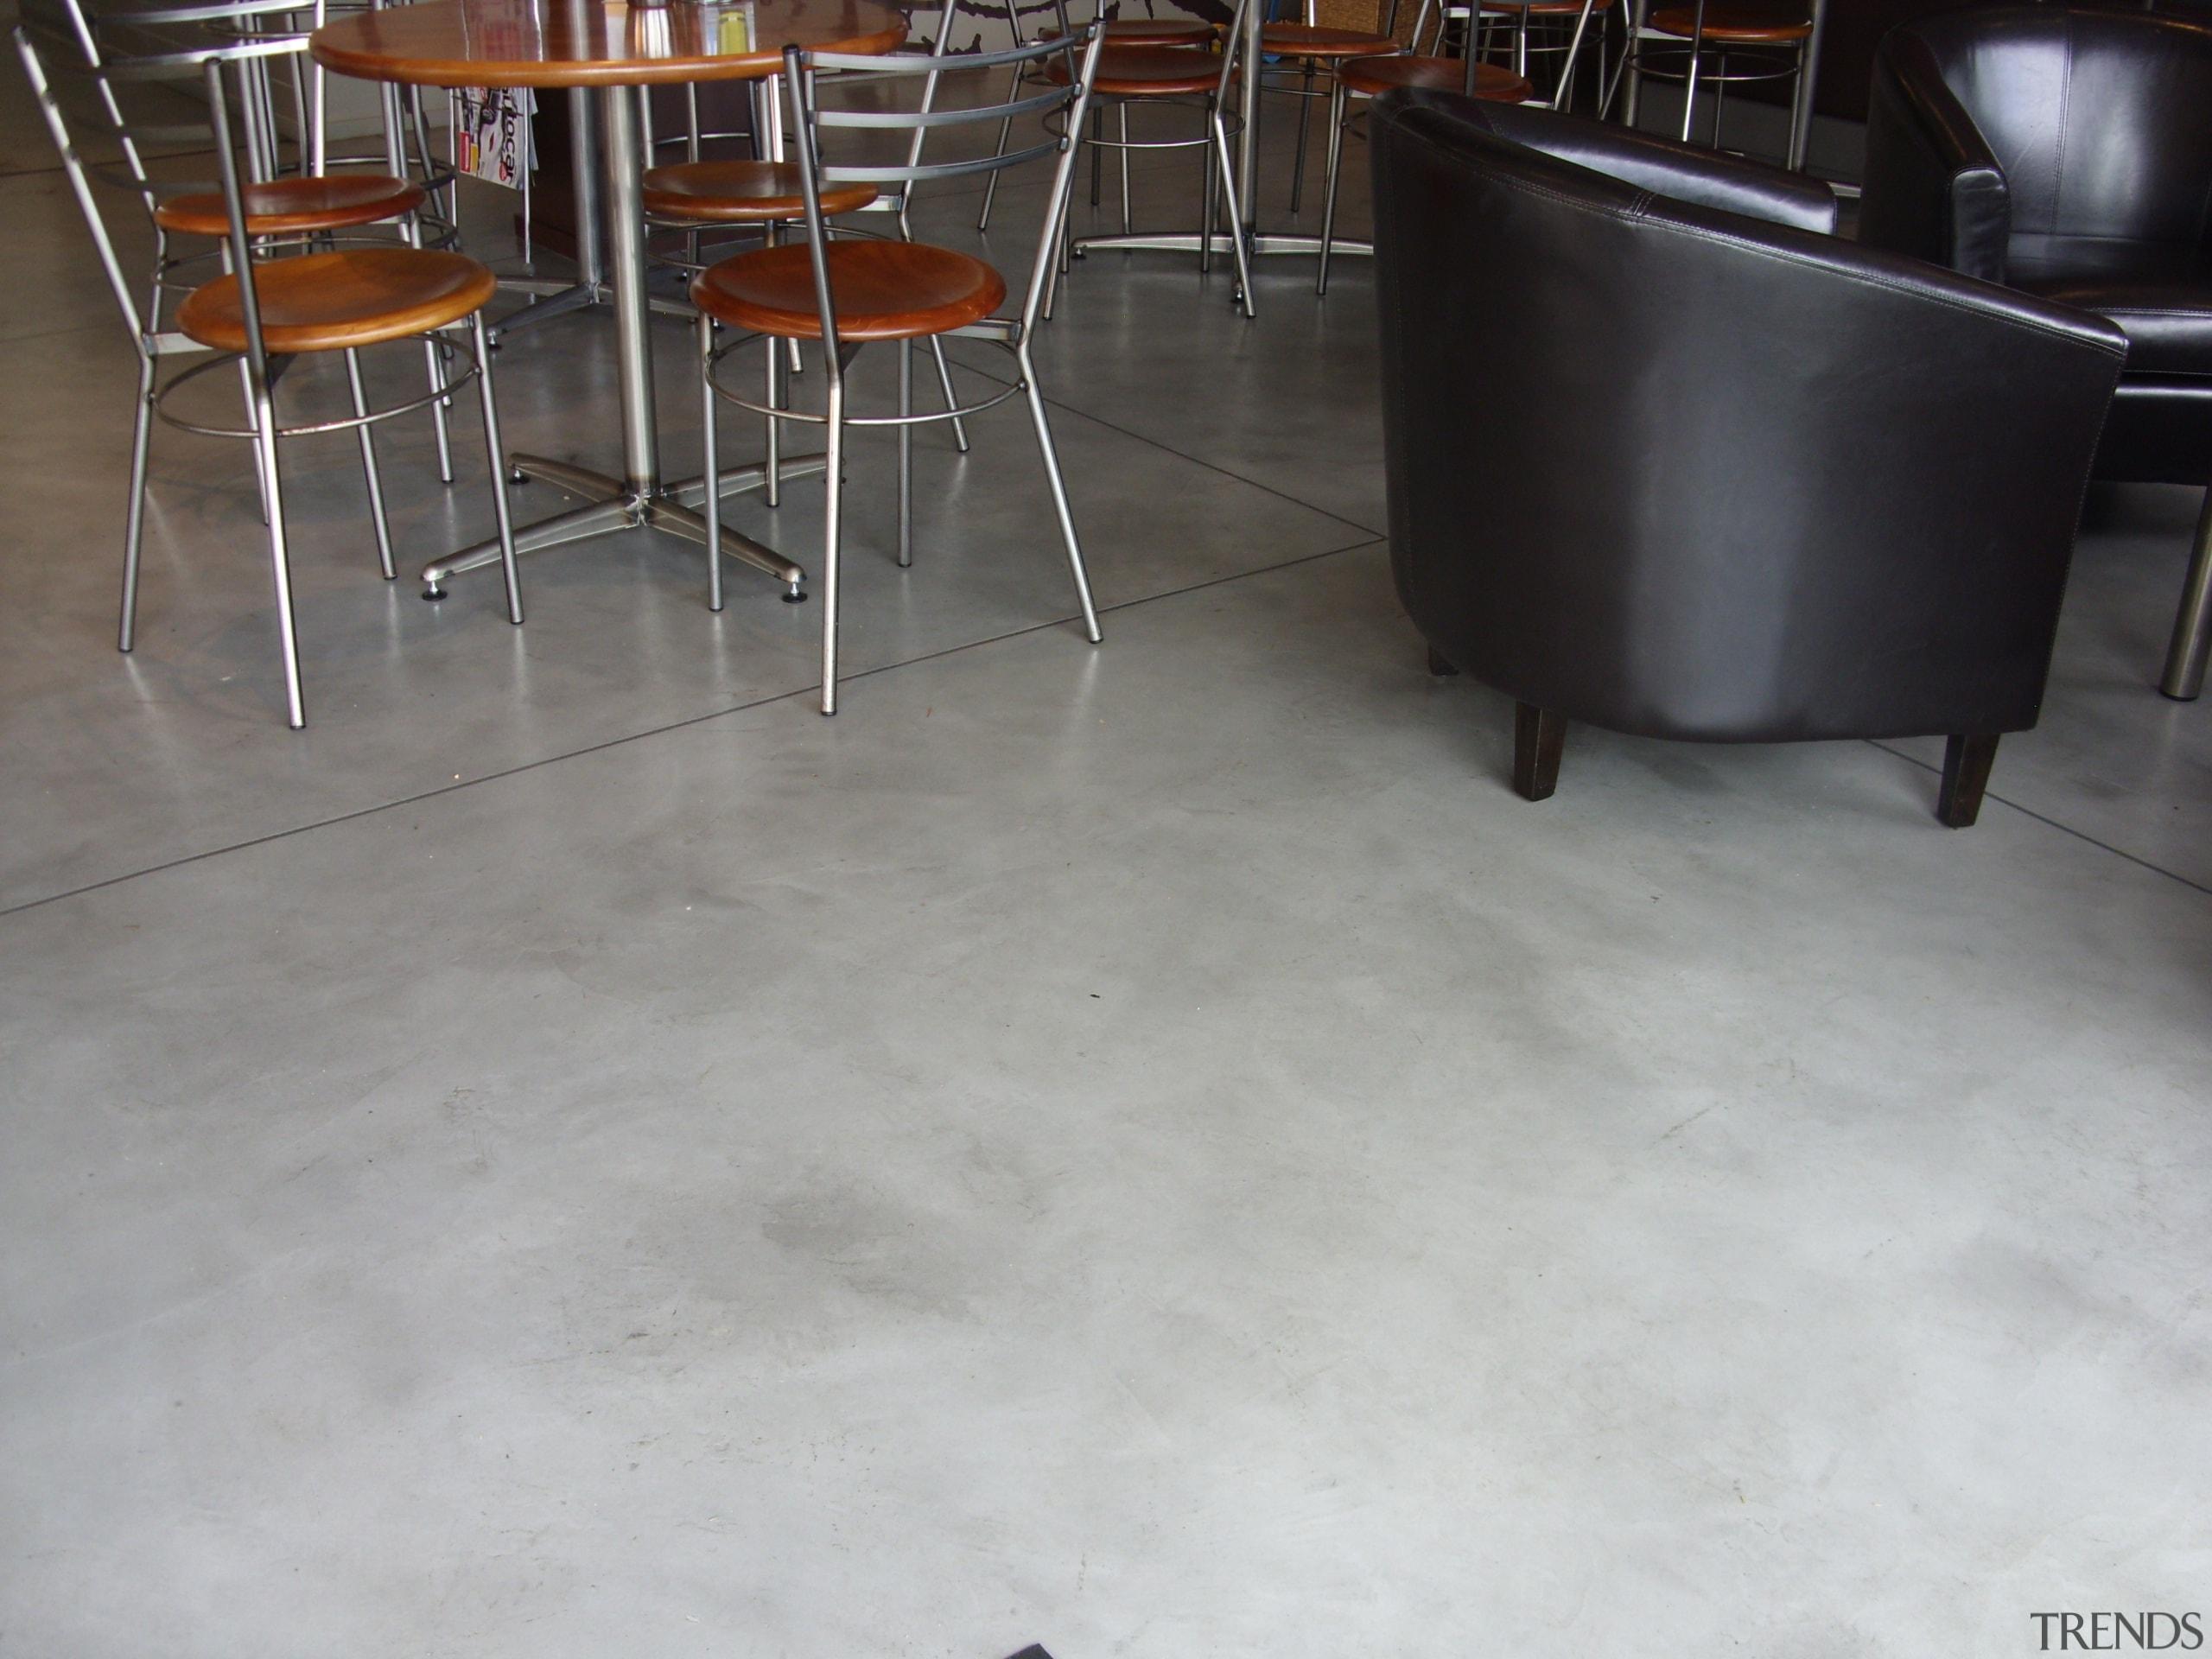 Micro Topping 34 - Micro Topping_34 - chair chair, concrete, floor, flooring, furniture, hardwood, laminate flooring, table, tile, wood, wood flooring, gray, black